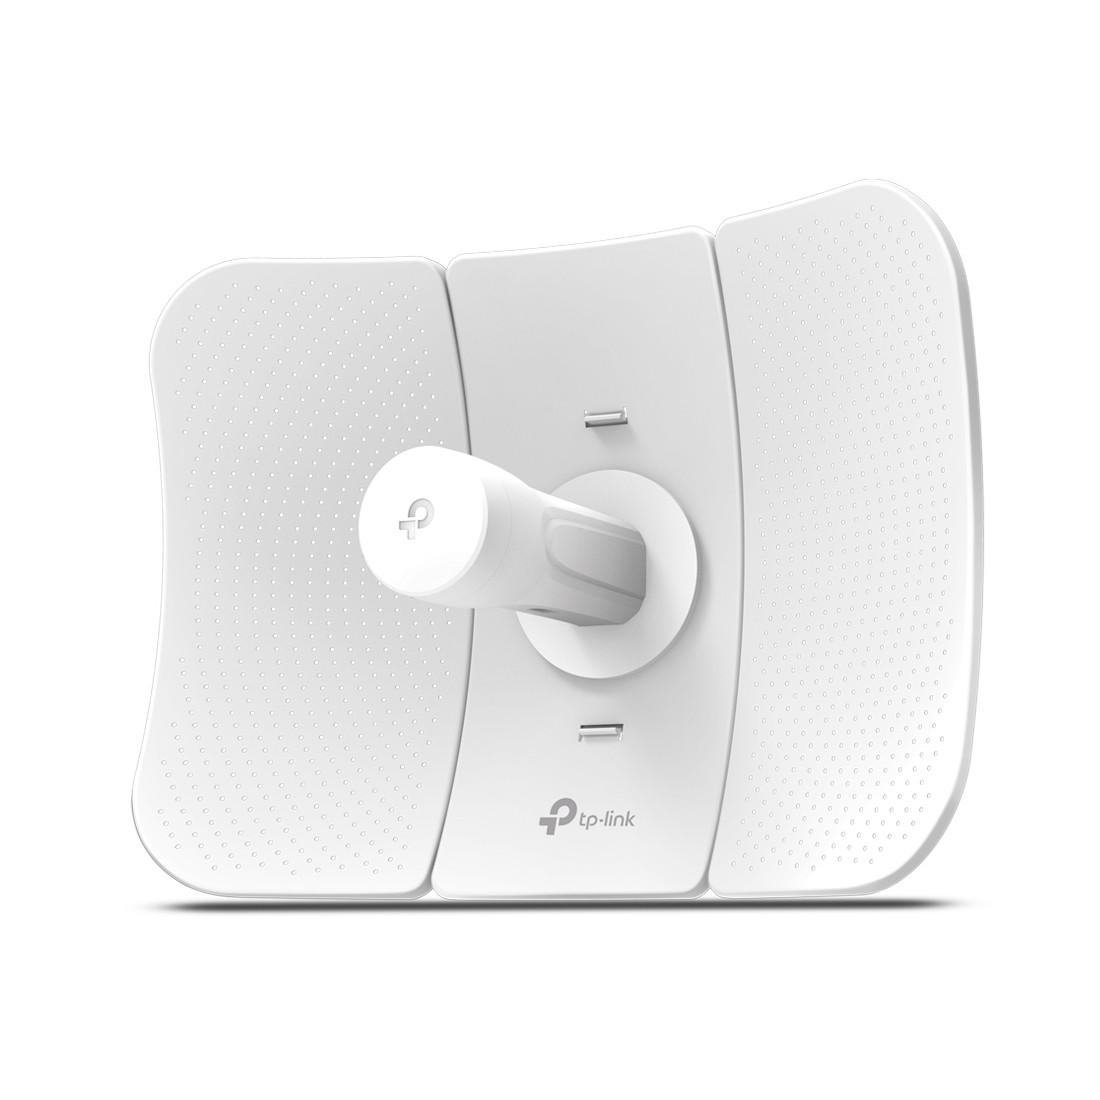 Наружная точка доступа Wi-Fi TP-link CPE605